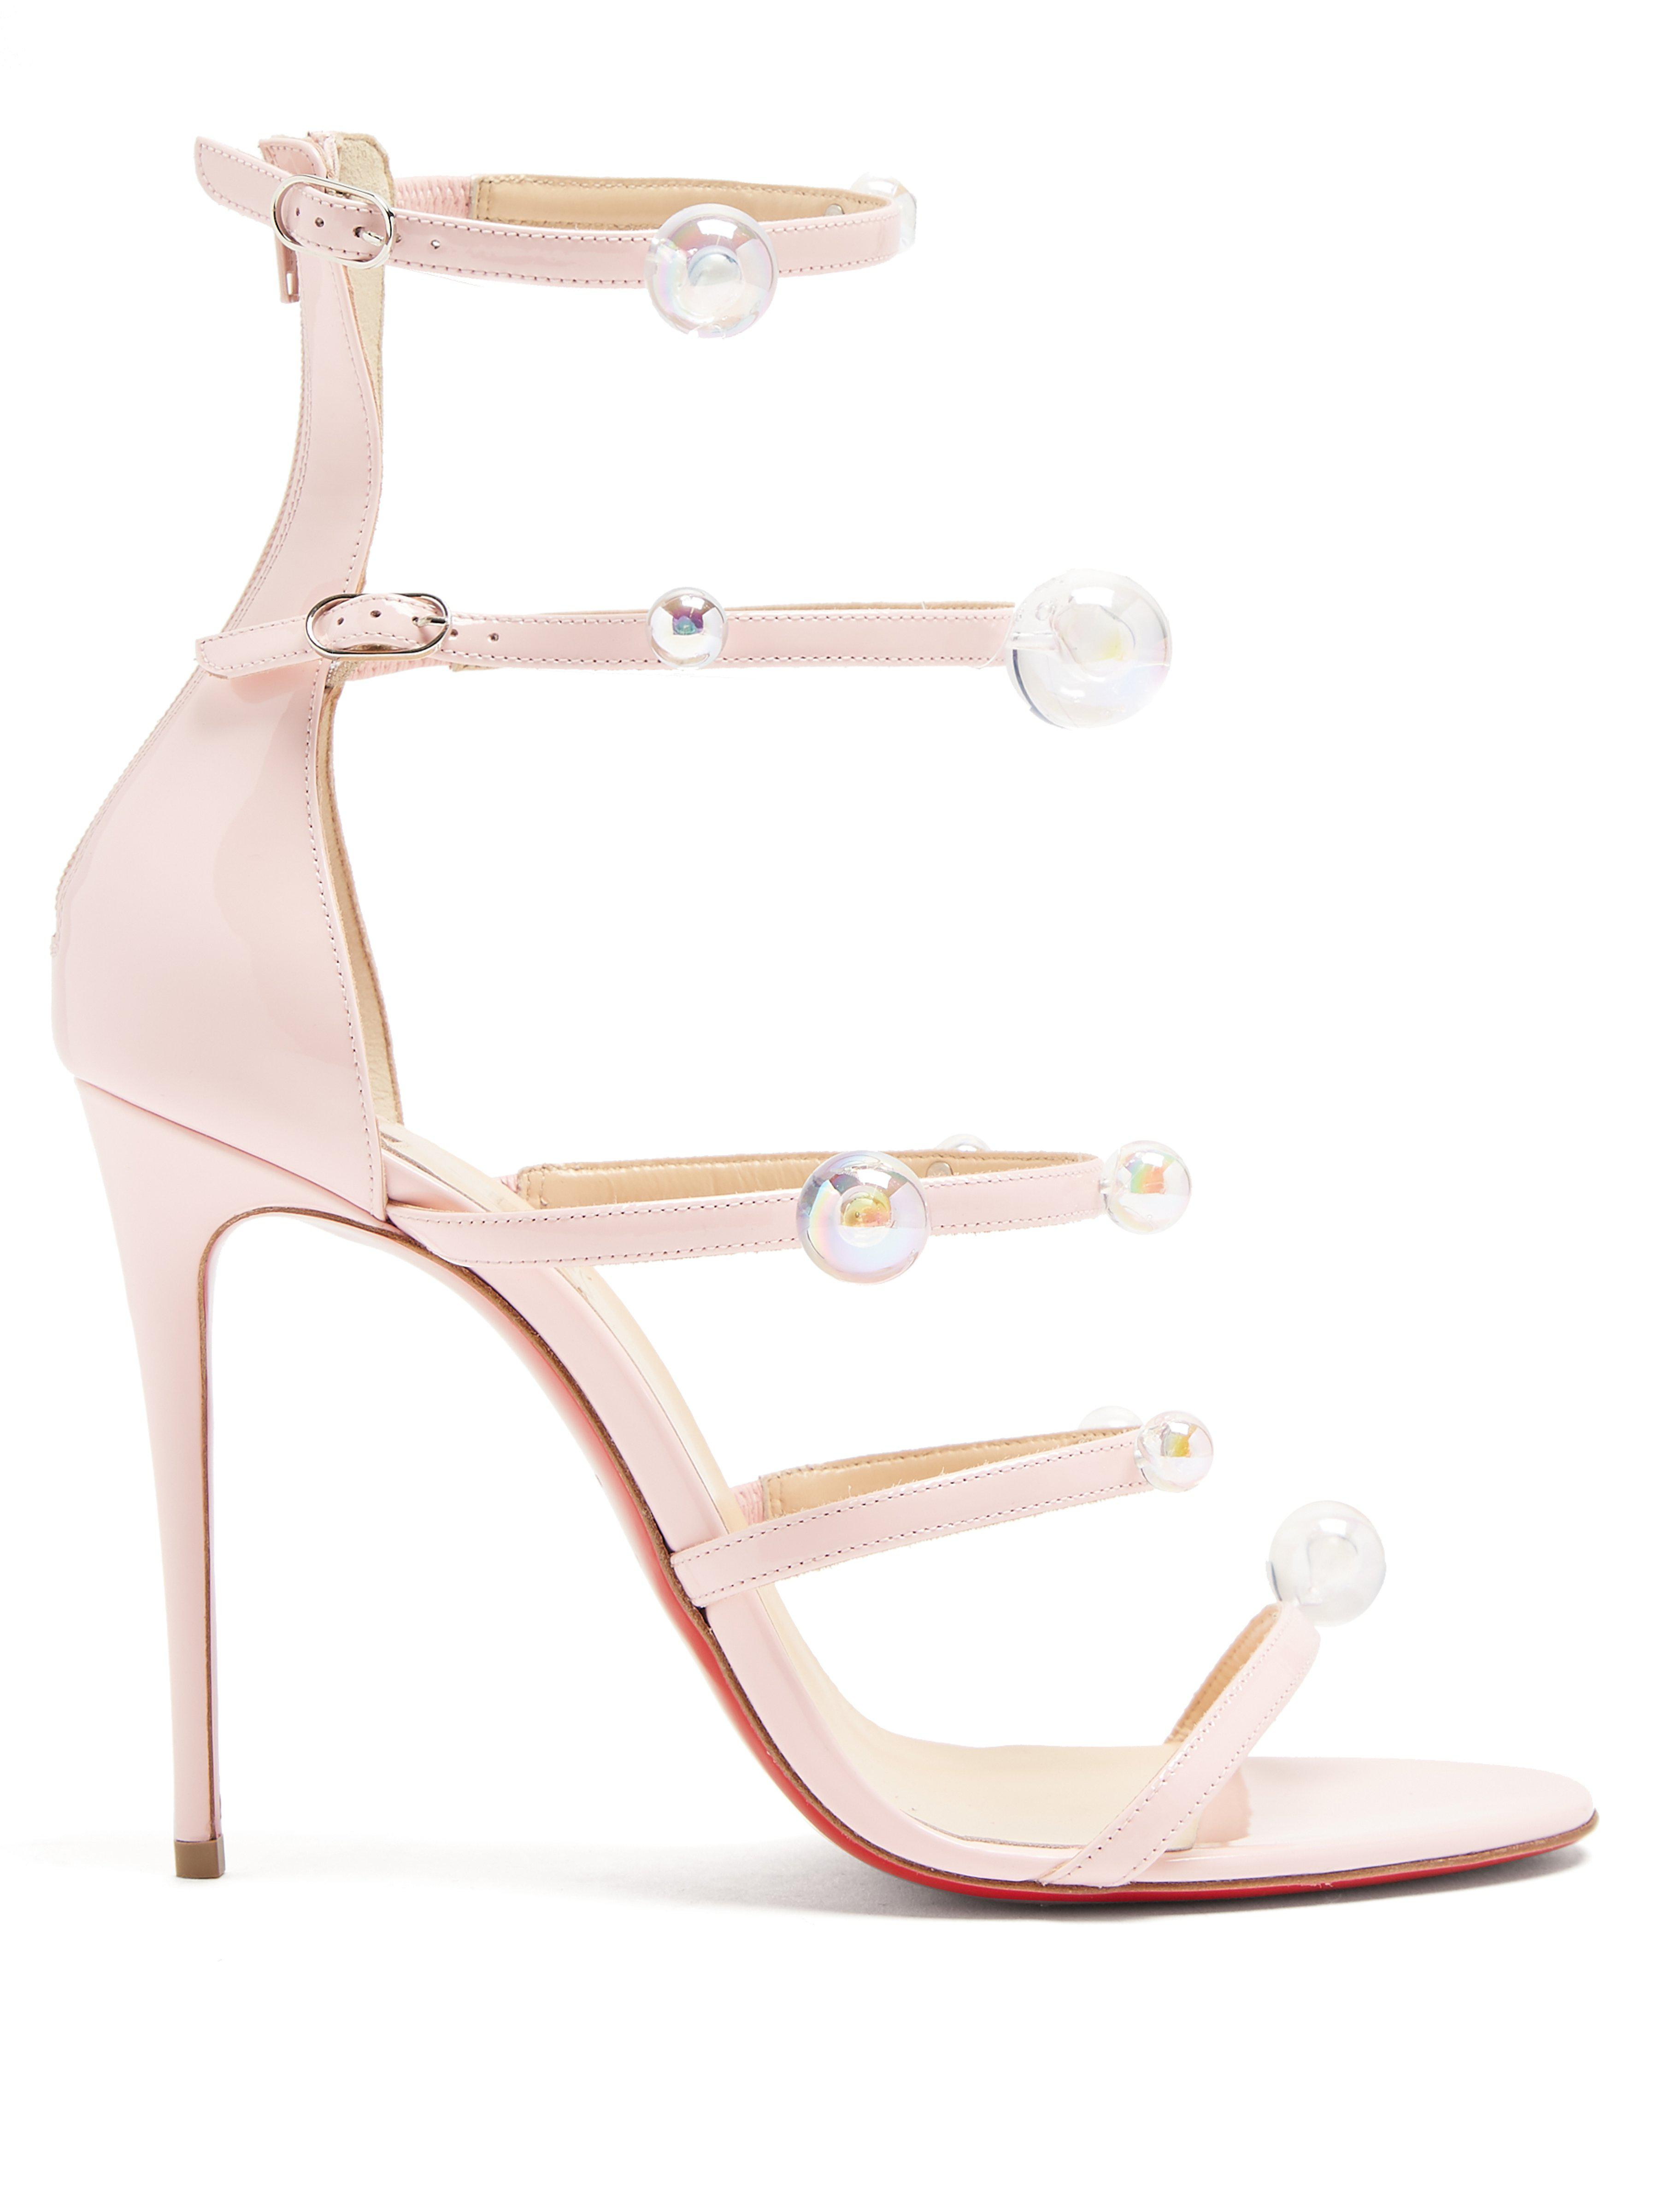 025db354d789a christian-louboutin-pink-multi-Antonana-100-Patent-Leather-Sandals.jpeg